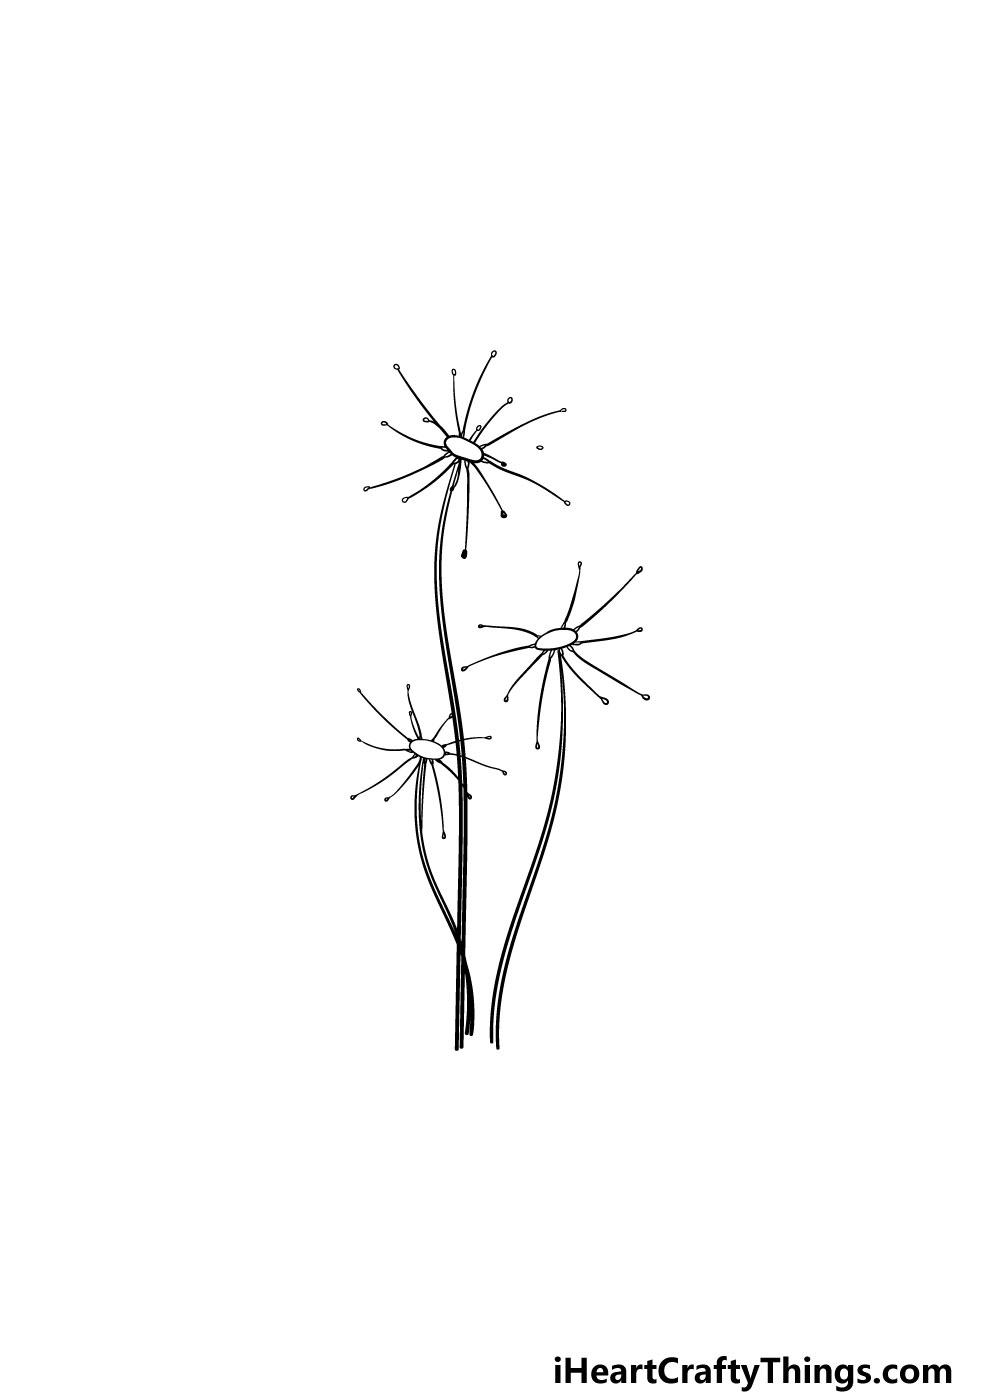 drawing a dandelion step 3